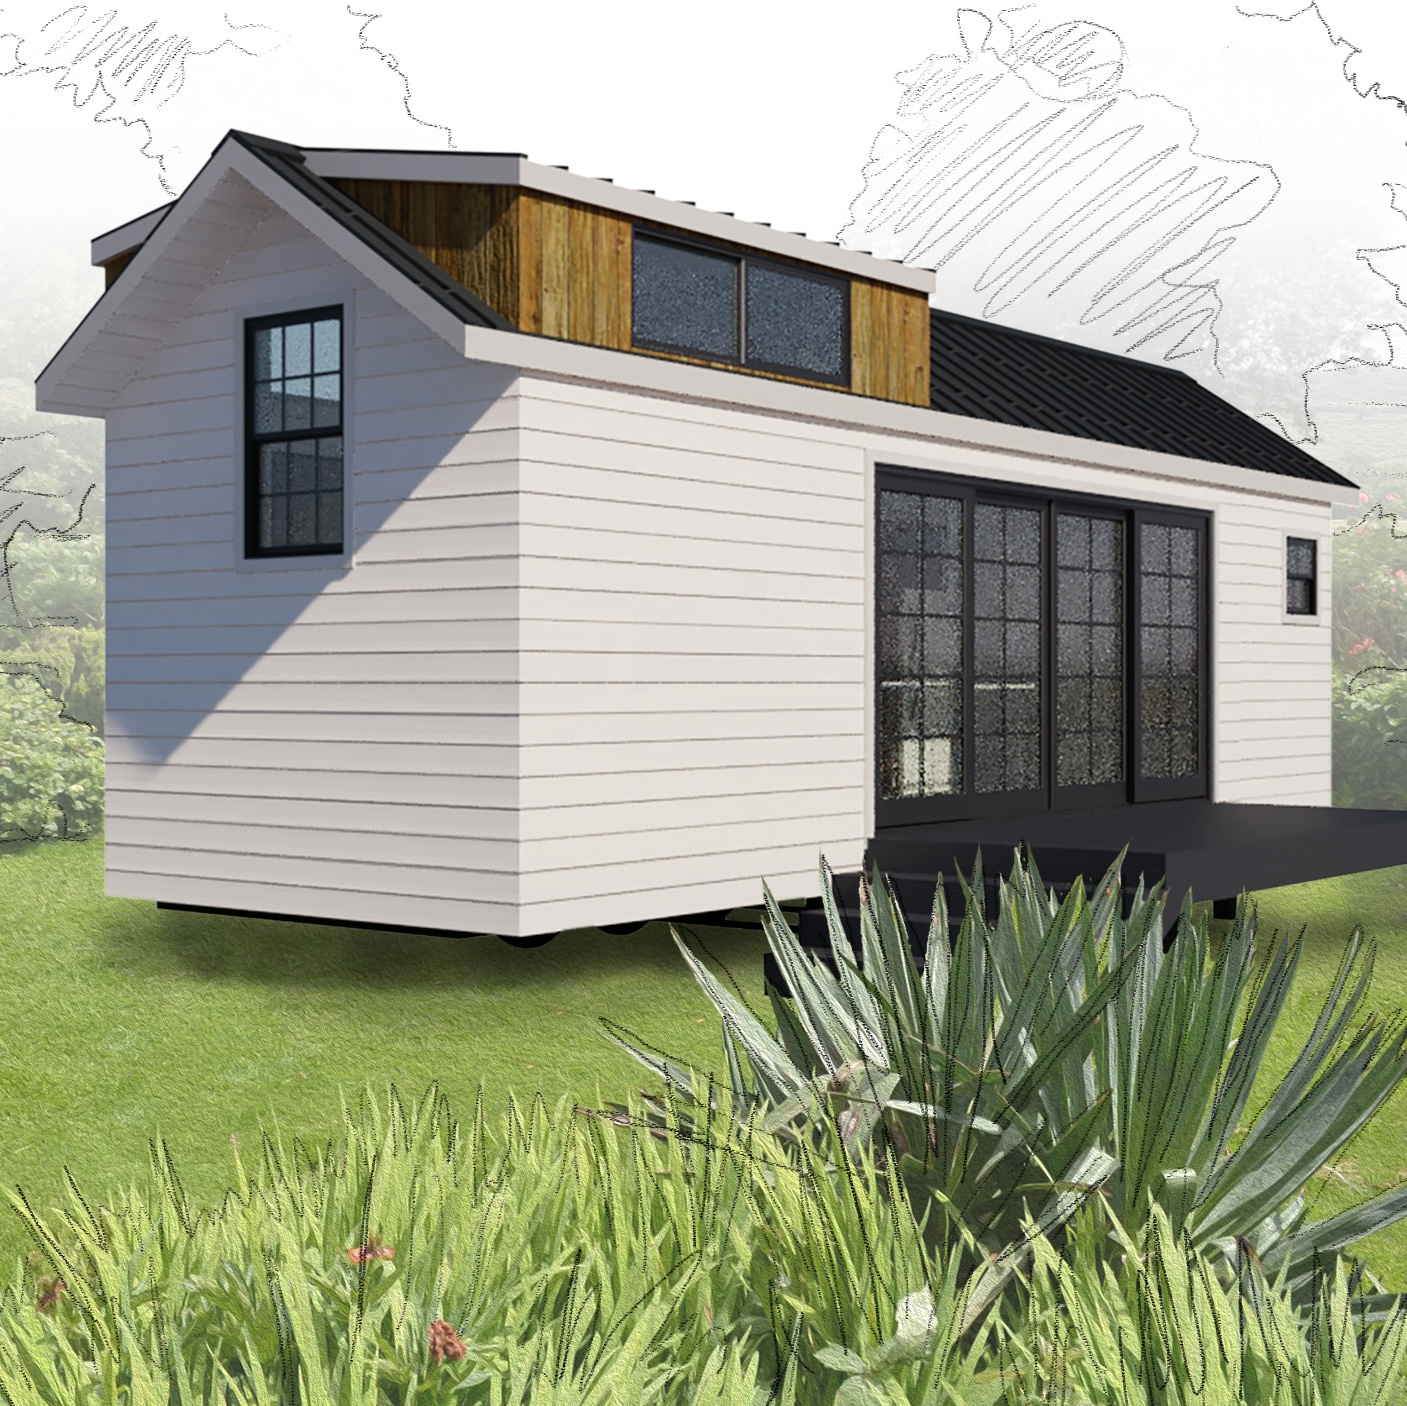 New Wind River Tiny Homes Models